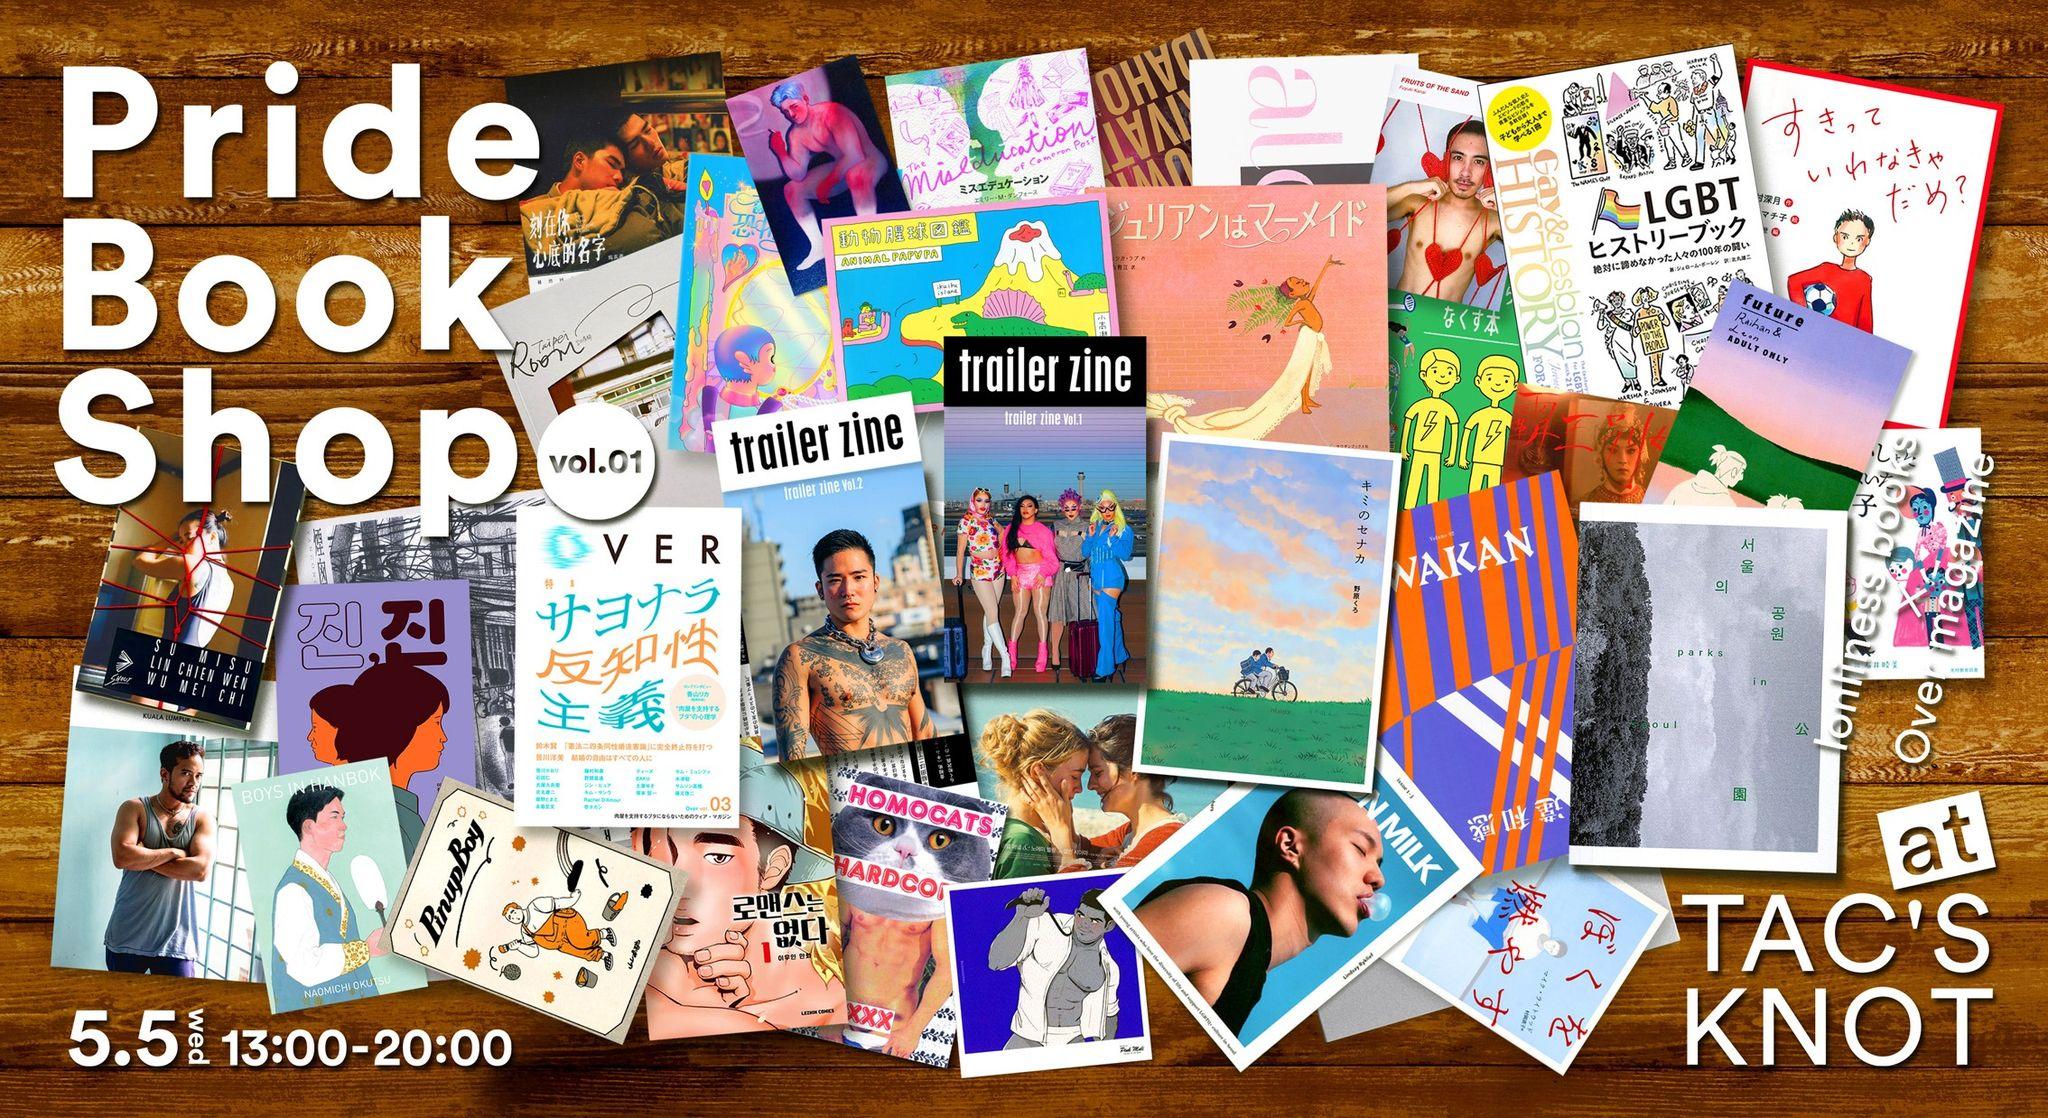 新刊『Over vol.03』会場先行販売決定!Pride Book Shop(5/5) 開催